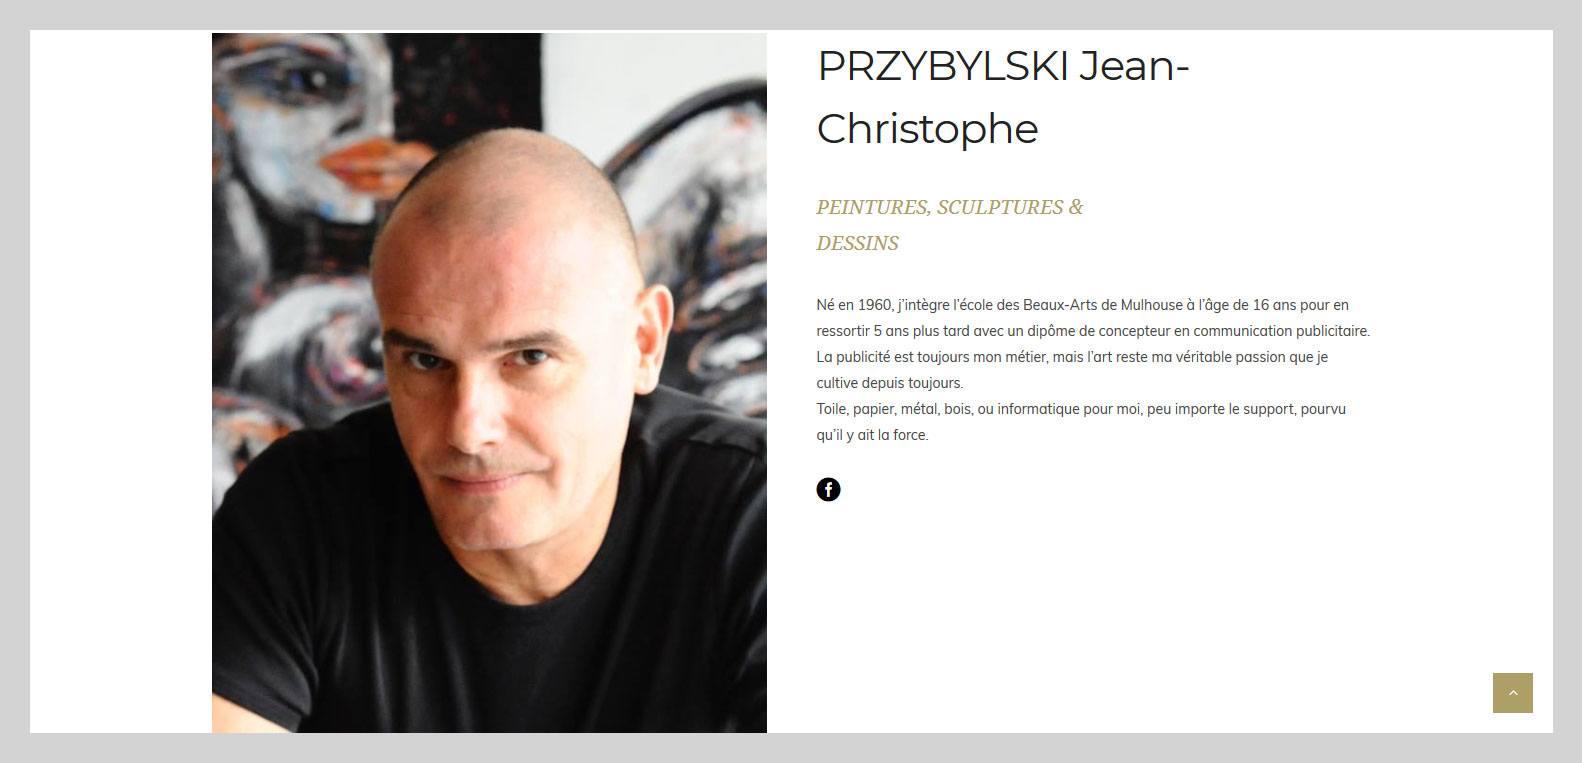 Jean Cristophe przybylski, artiste et client Karedess, agence web situé à Mulhouse